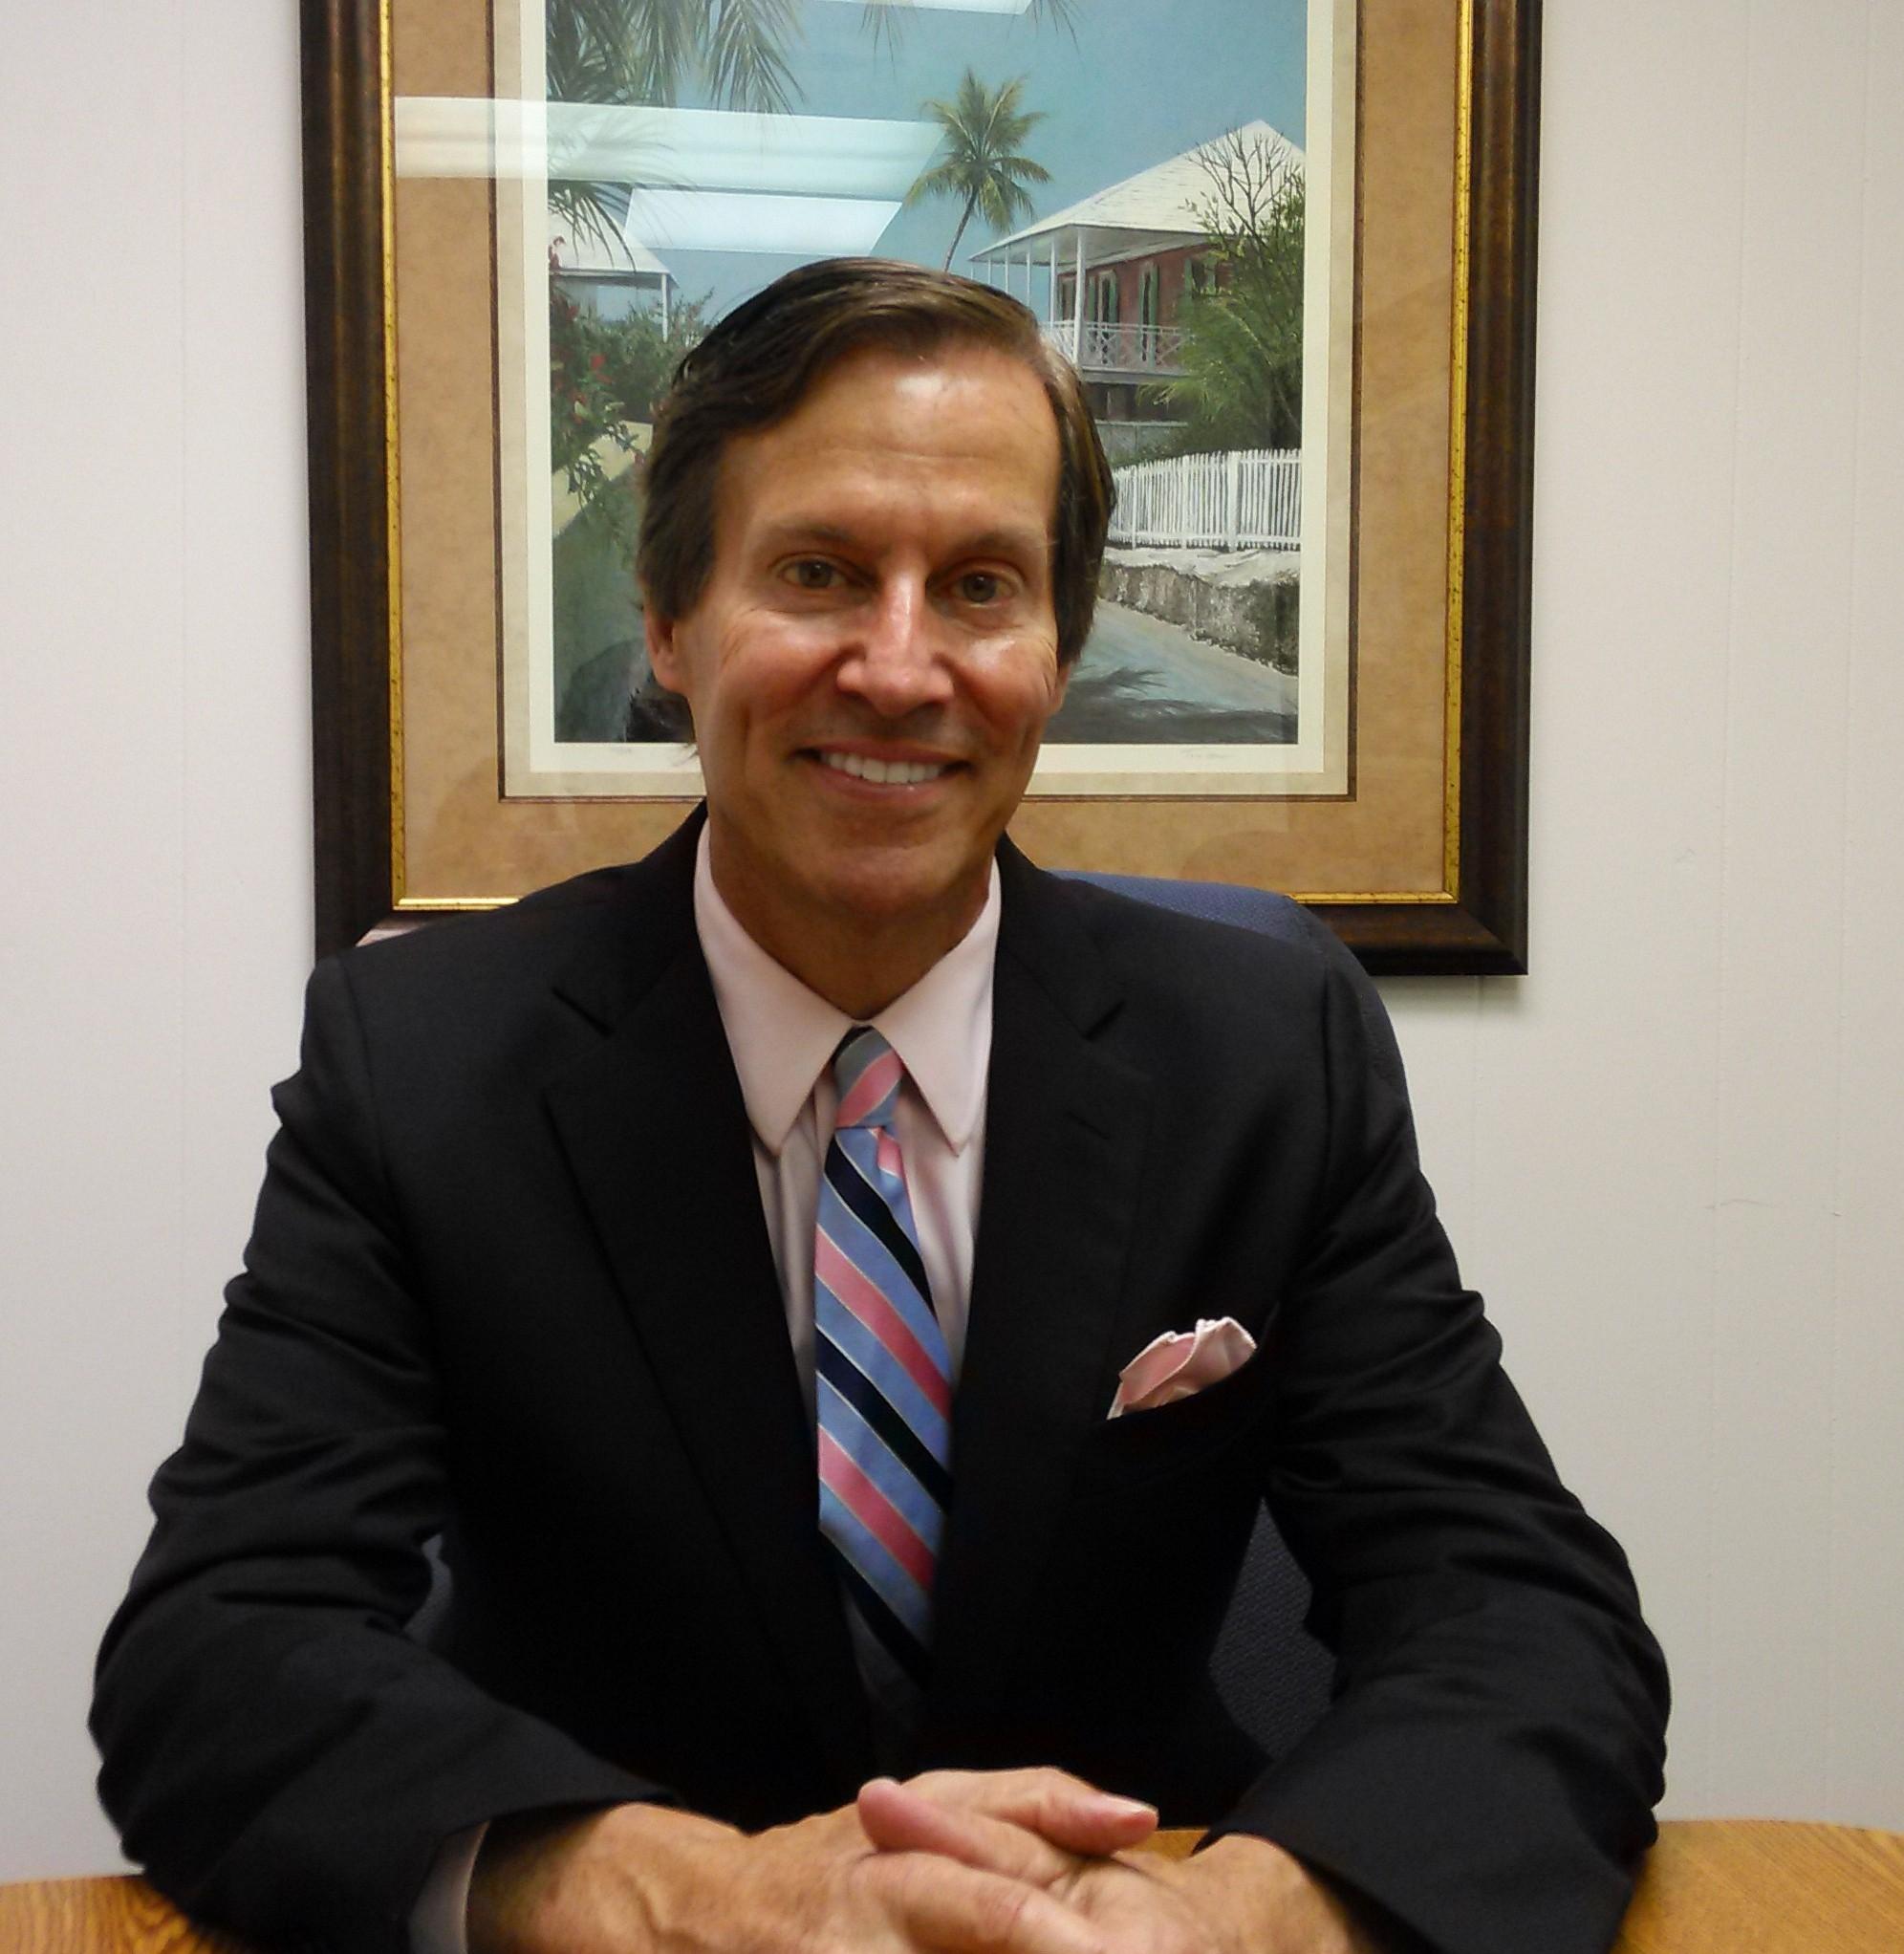 Bar certified attorneys in West Palm Beach